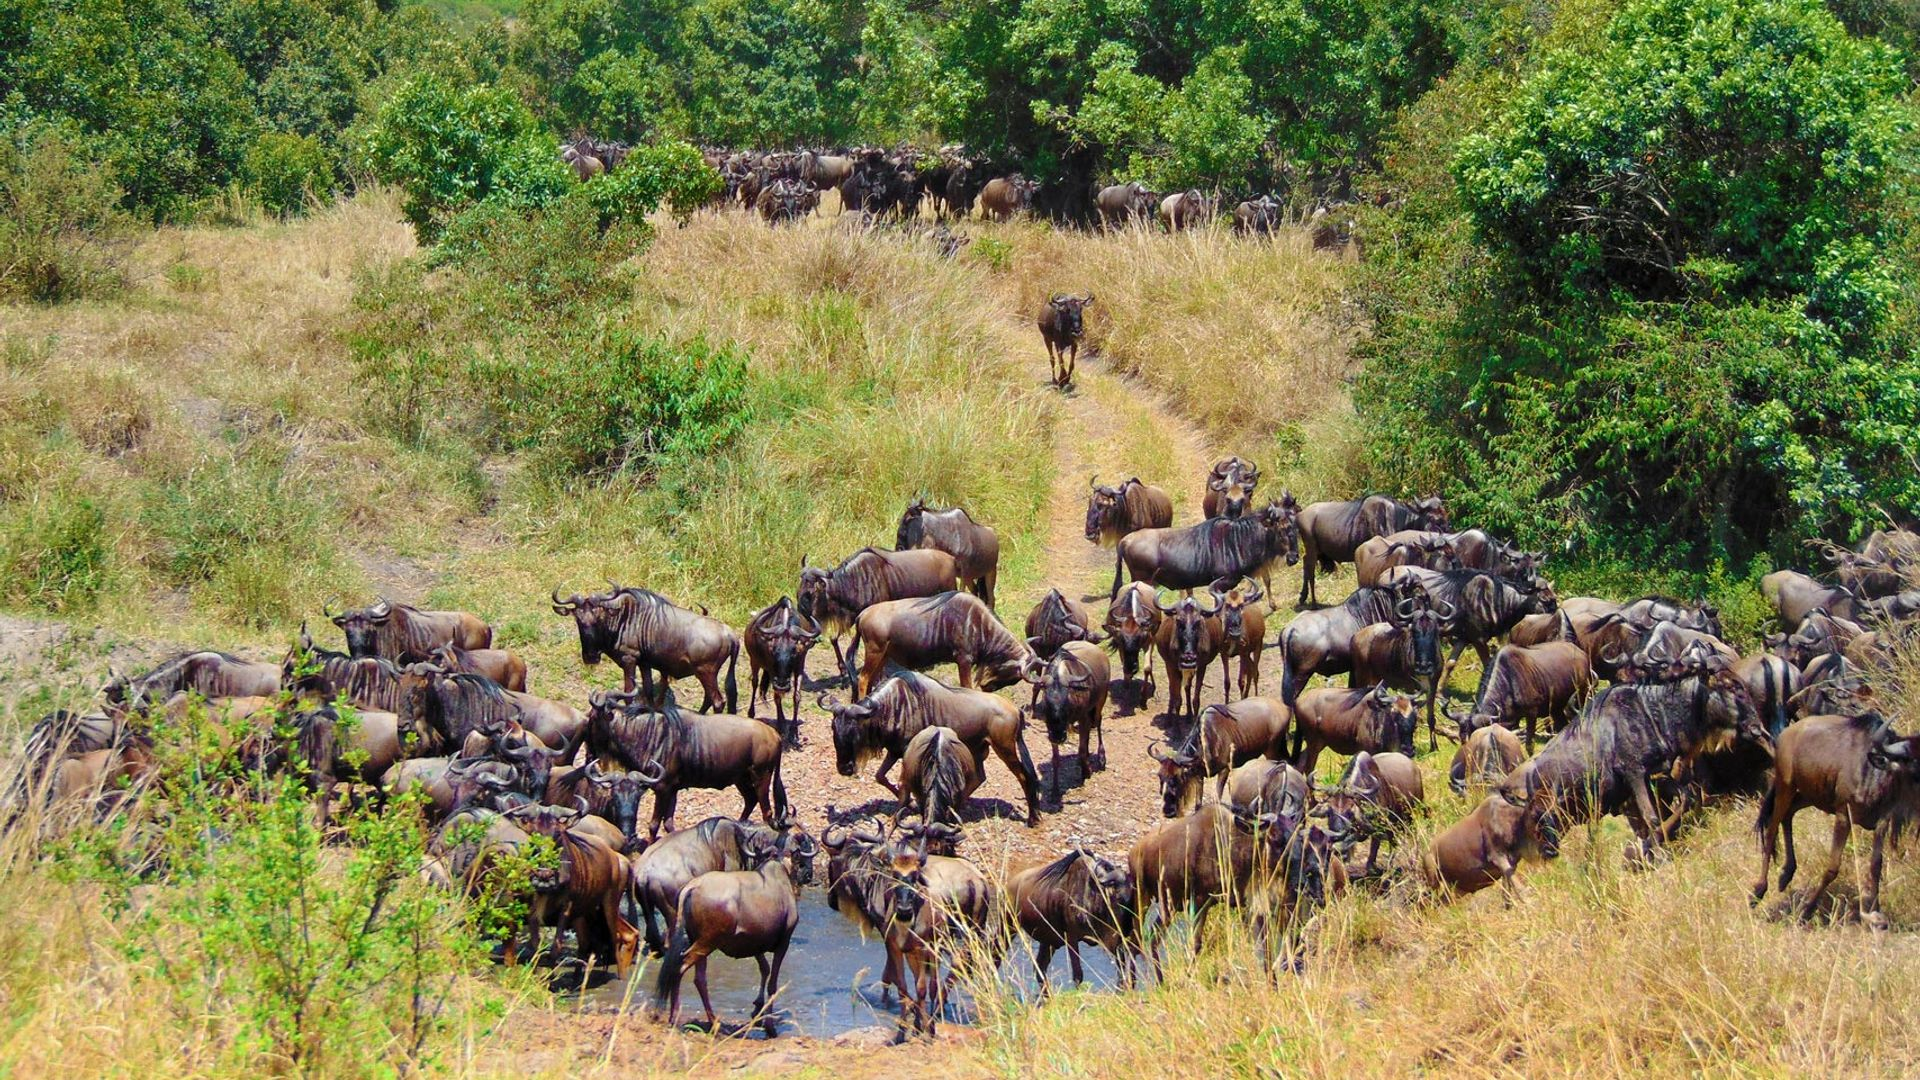 Circuit de grup - Kenya, safari Marea Migratie, 11 zile - iulie 2021 - cu Yulicary Sarracent